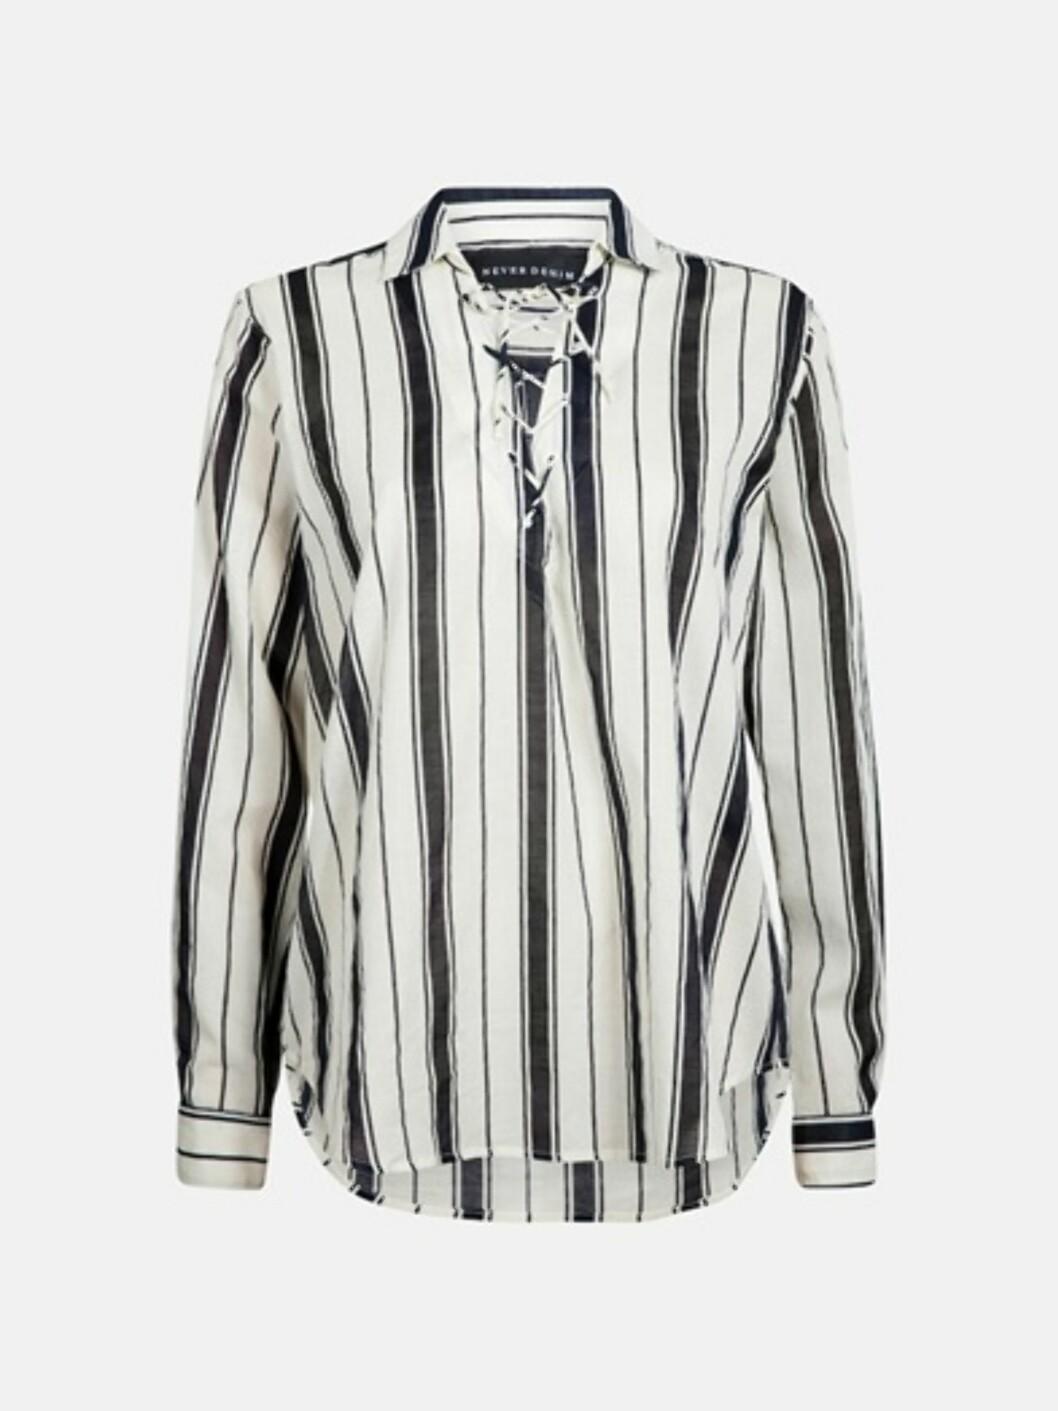 Skjorte fra Never Denim, kr 499. Foto: BikBok.no